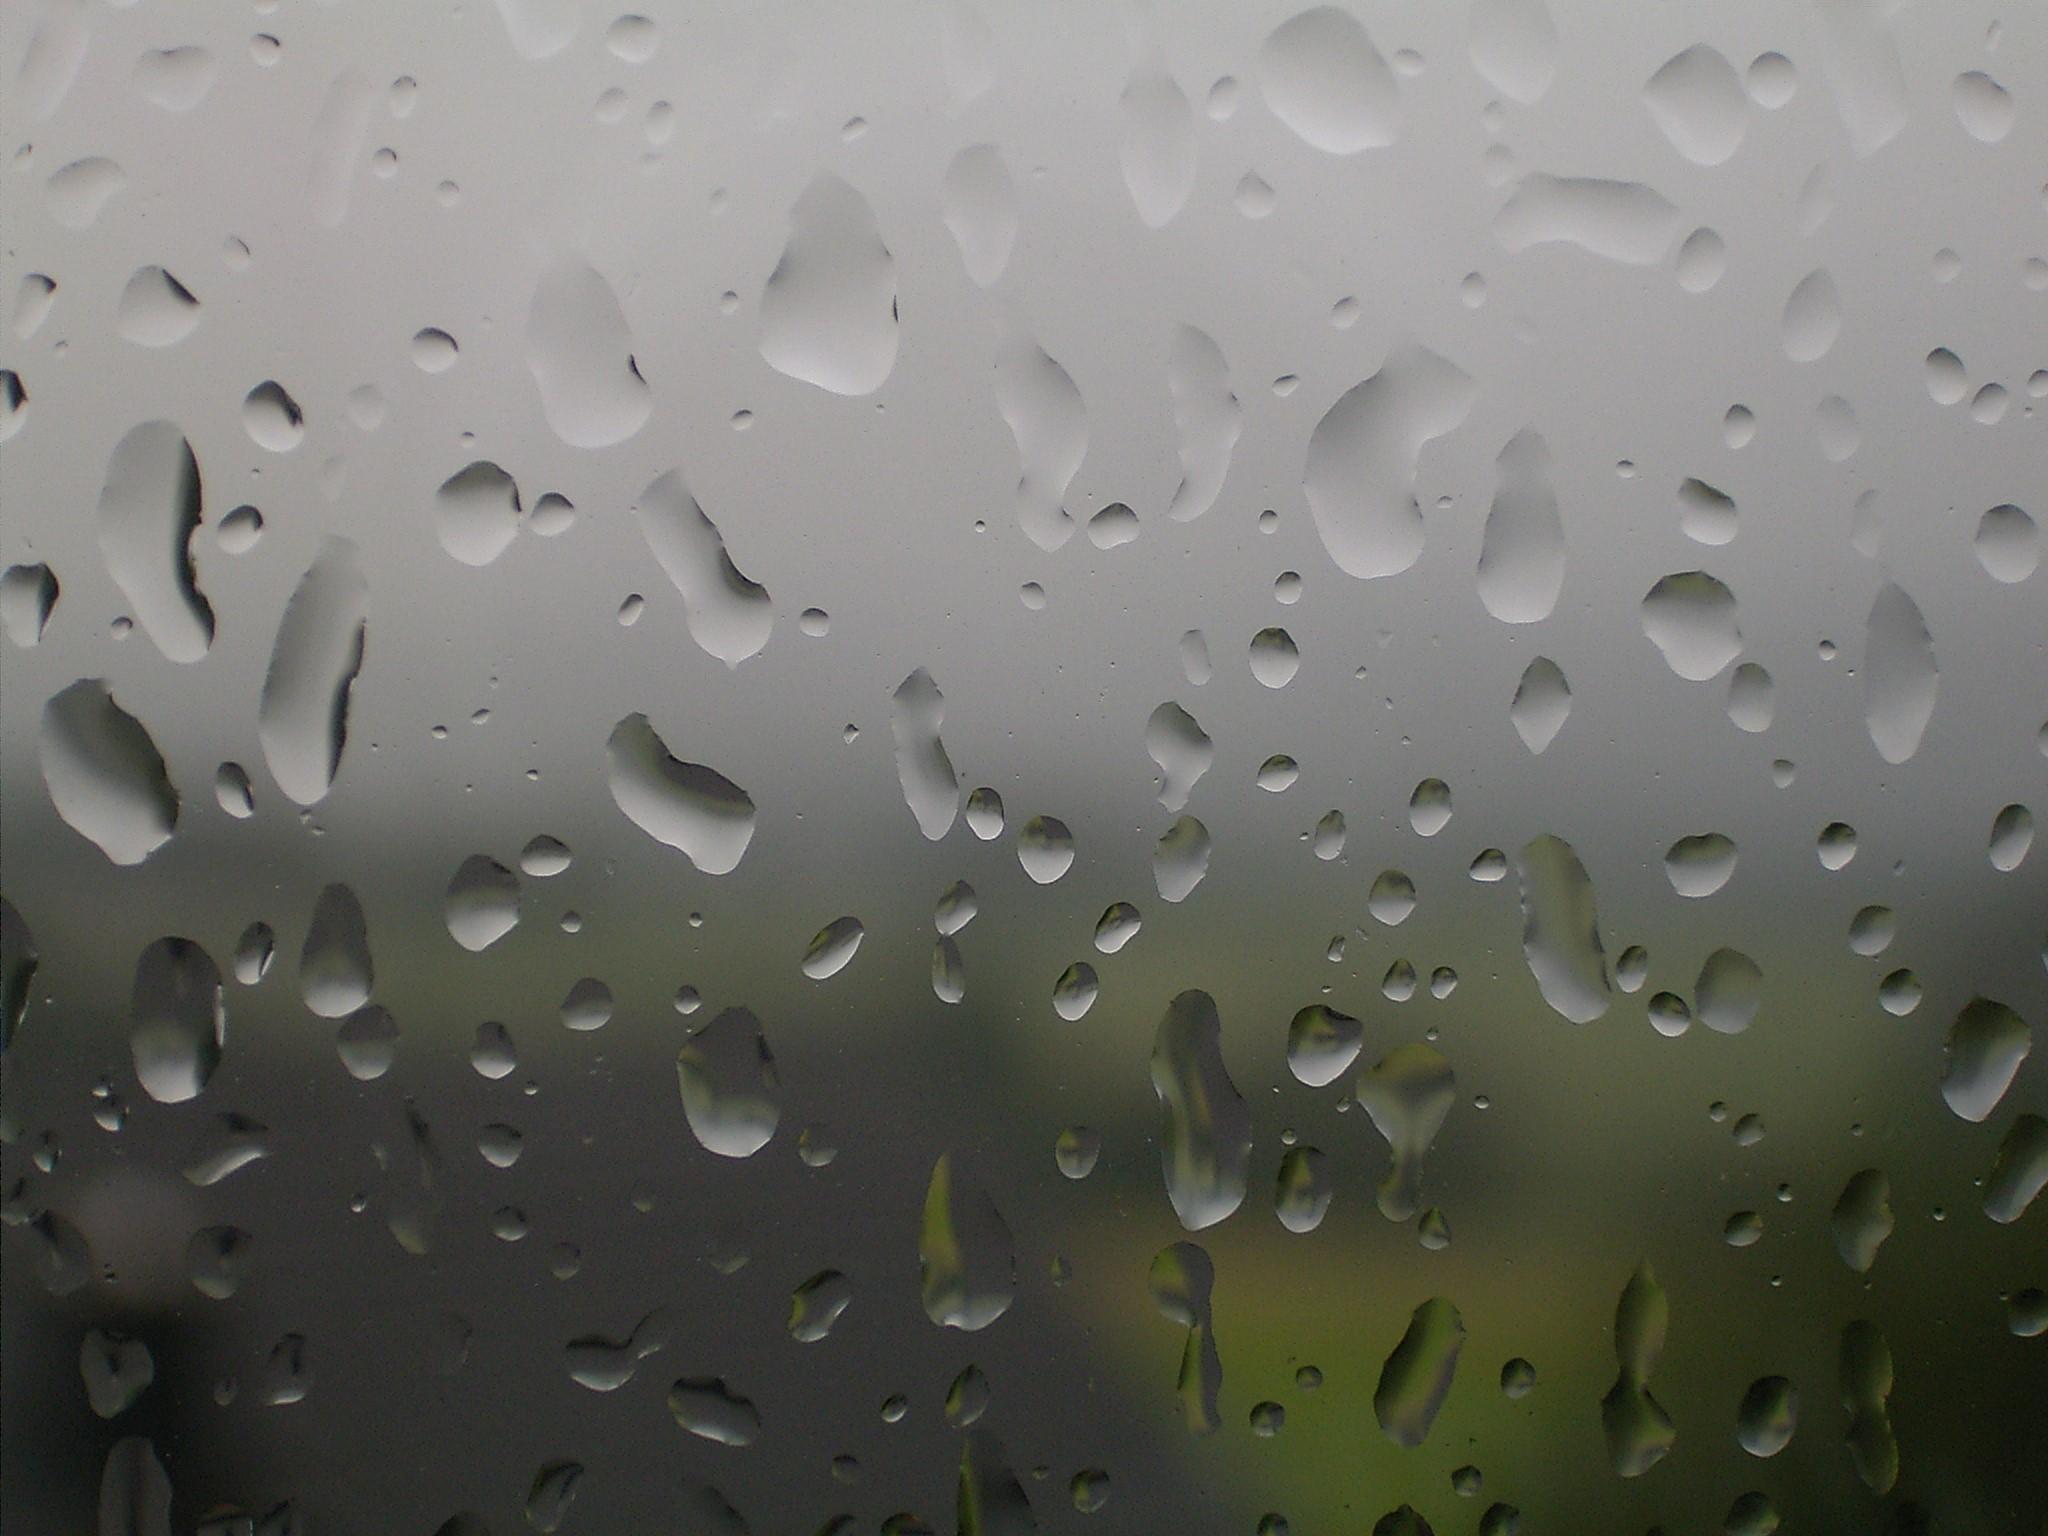 Unique Raindrops On Window 03 Iesjpg Throughout Decor